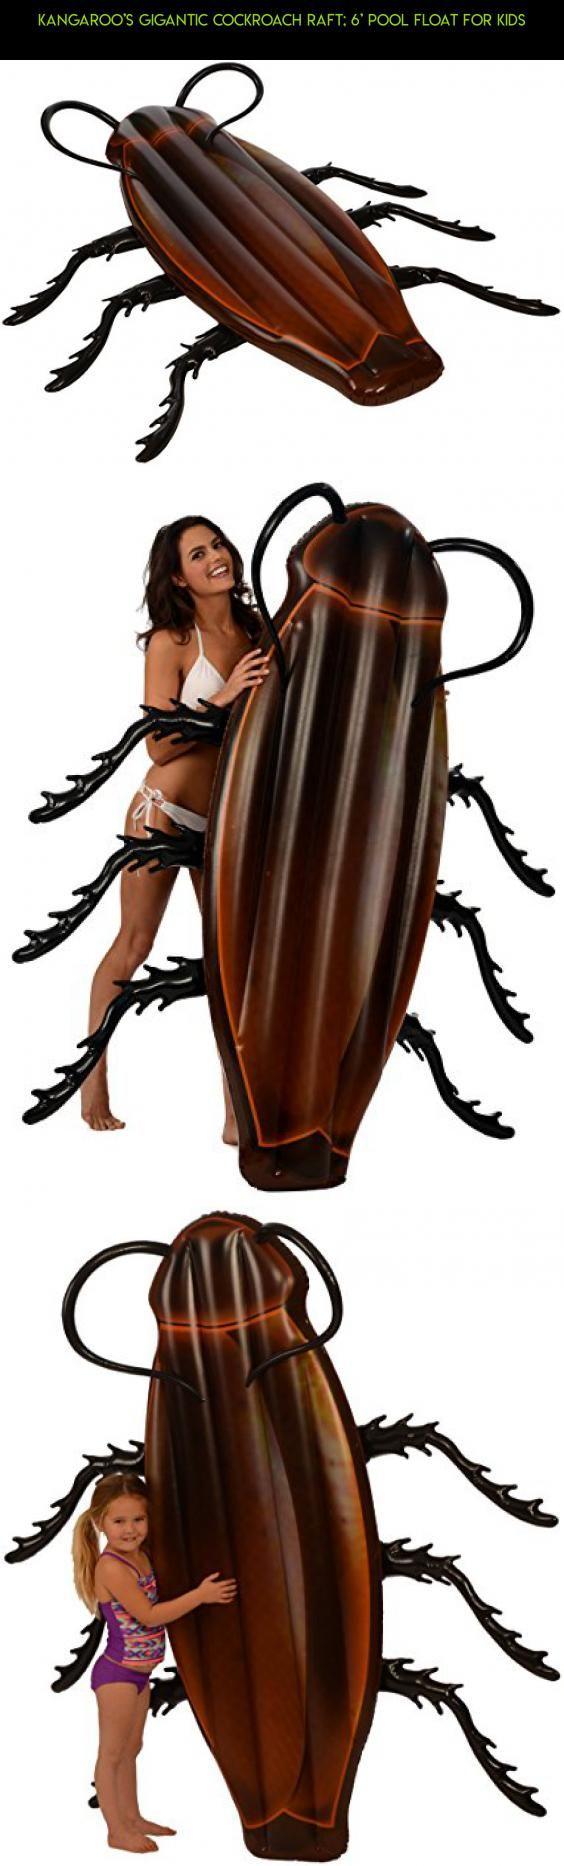 564x1866 Kangaroo's Gigantic Cockroach Raft 6' Pool Float For Kids